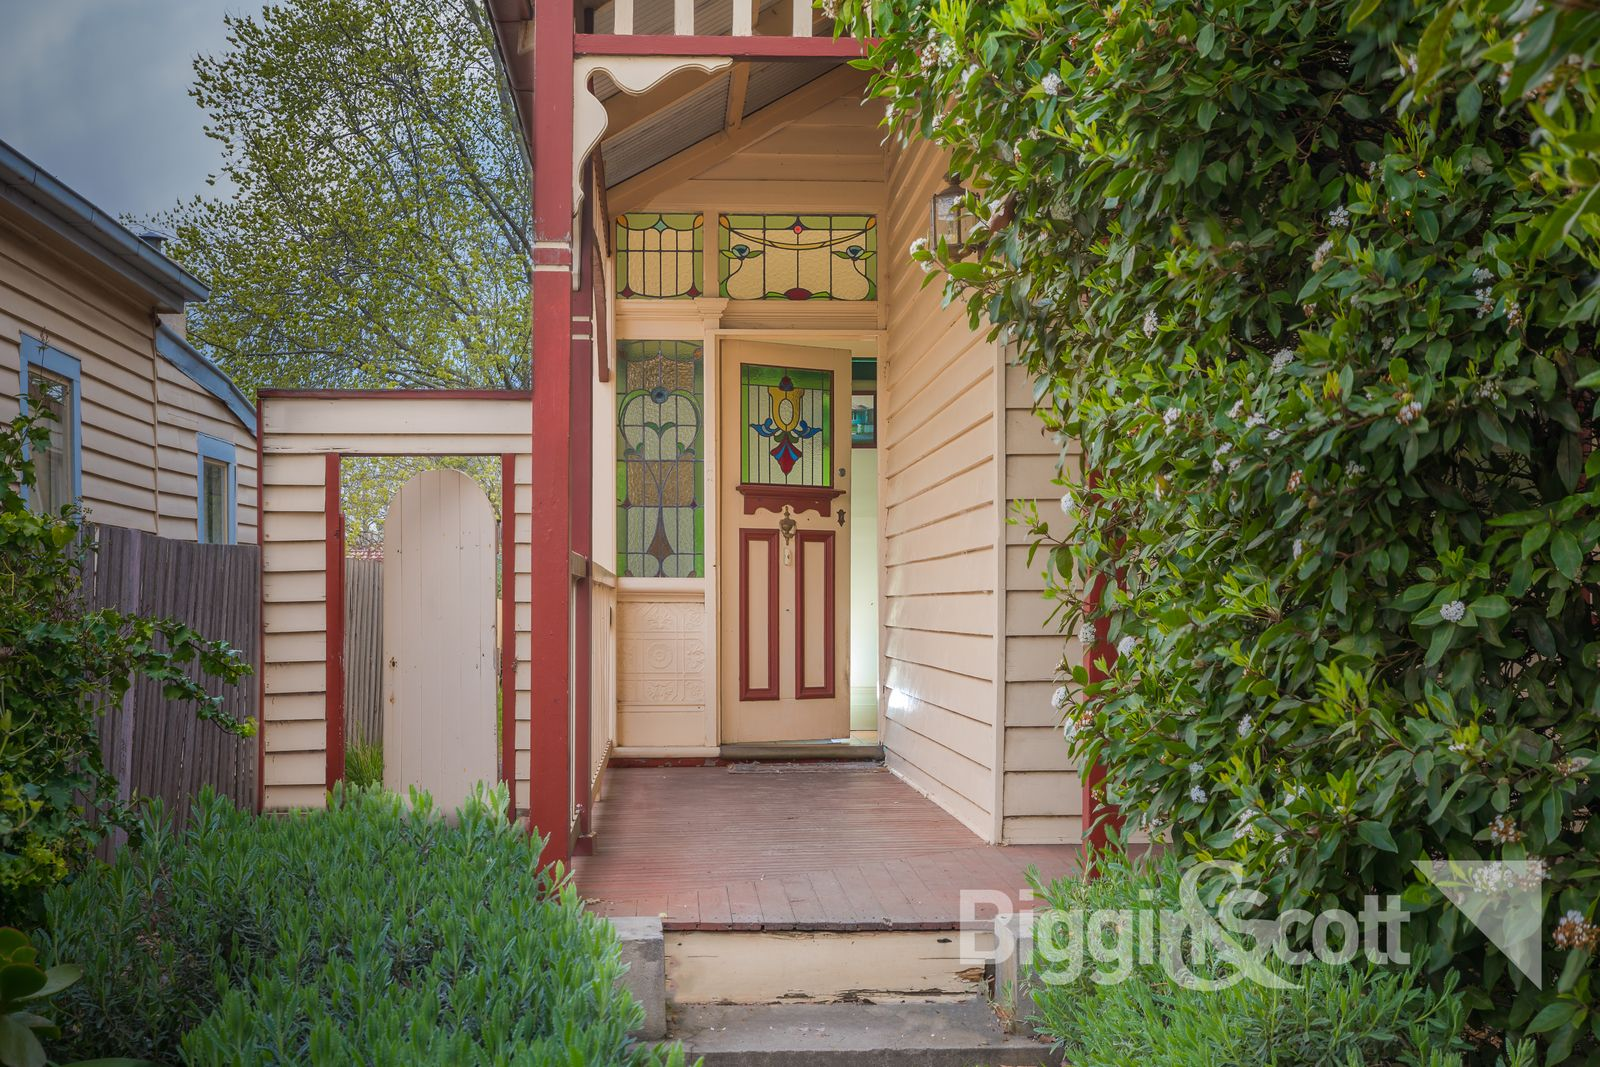 11 Church Street, Ballarat Central VIC 3350, Image 1